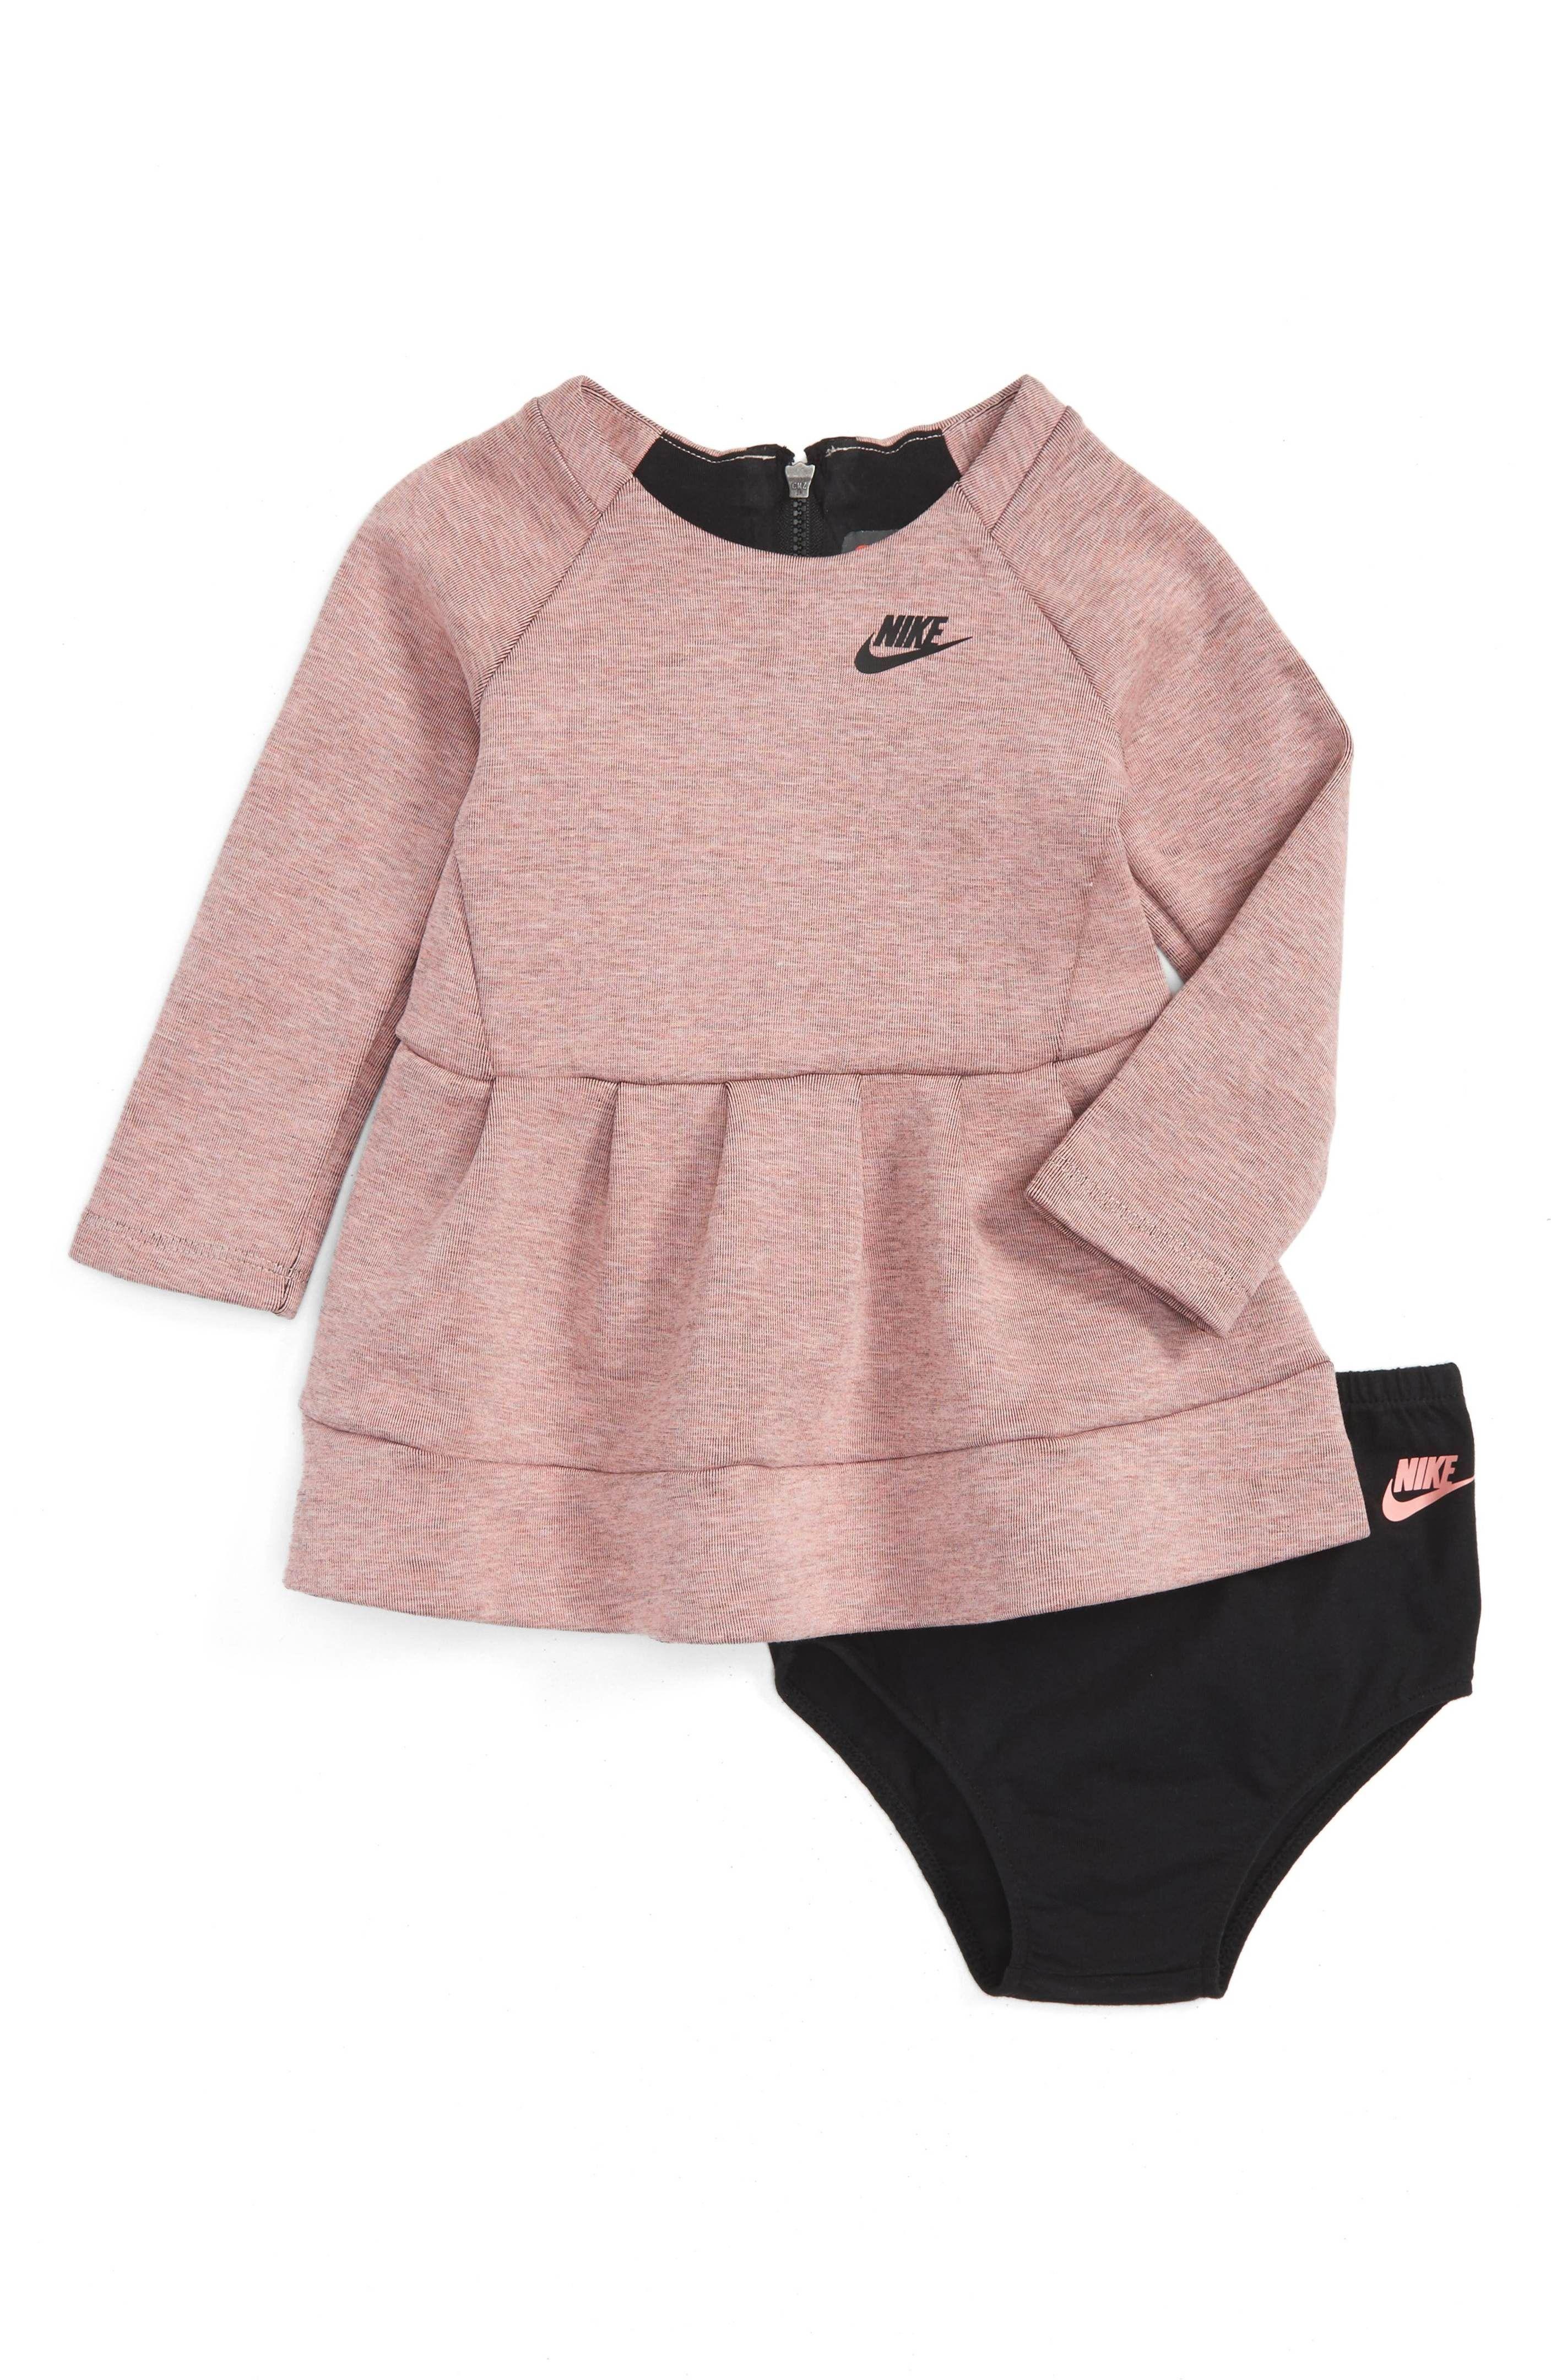 Main Image - Nike Tech Pack Fleece Dress (Baby Girls)